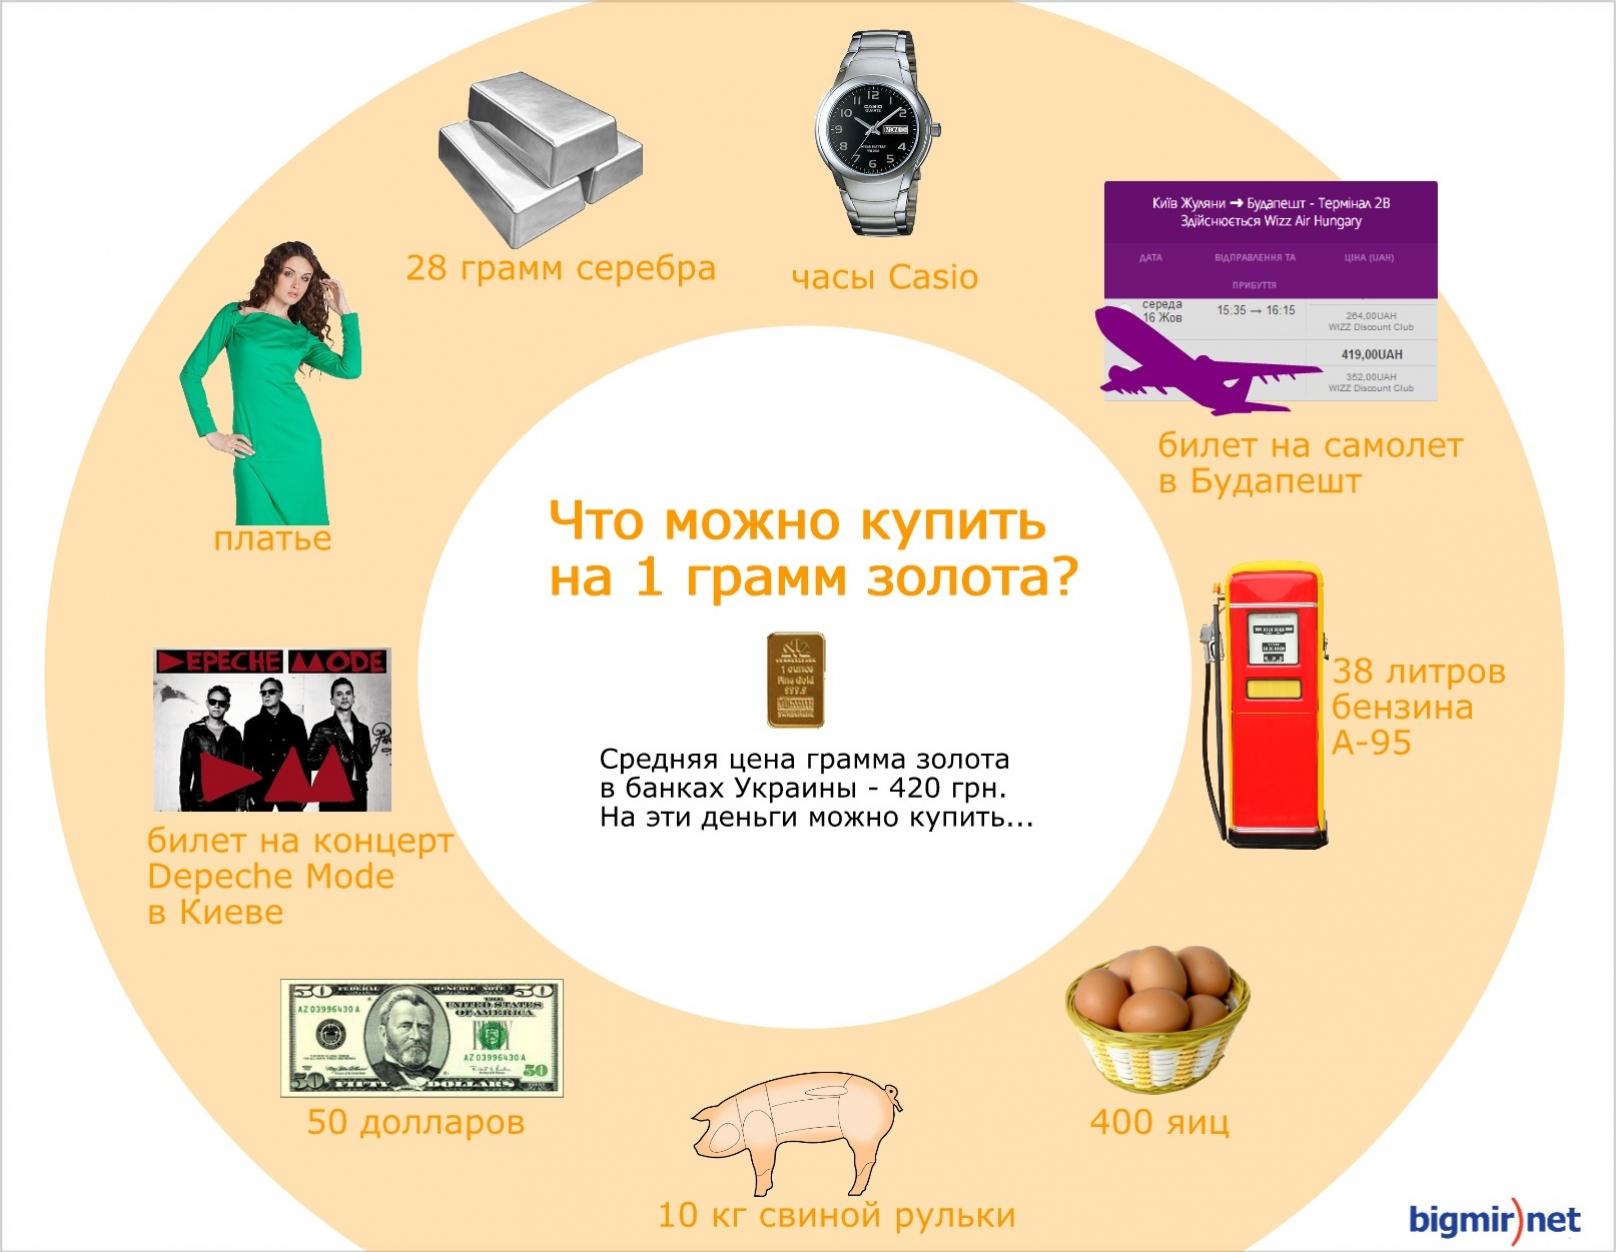 Цена 1 грамма золота в Украине. Много или мало?